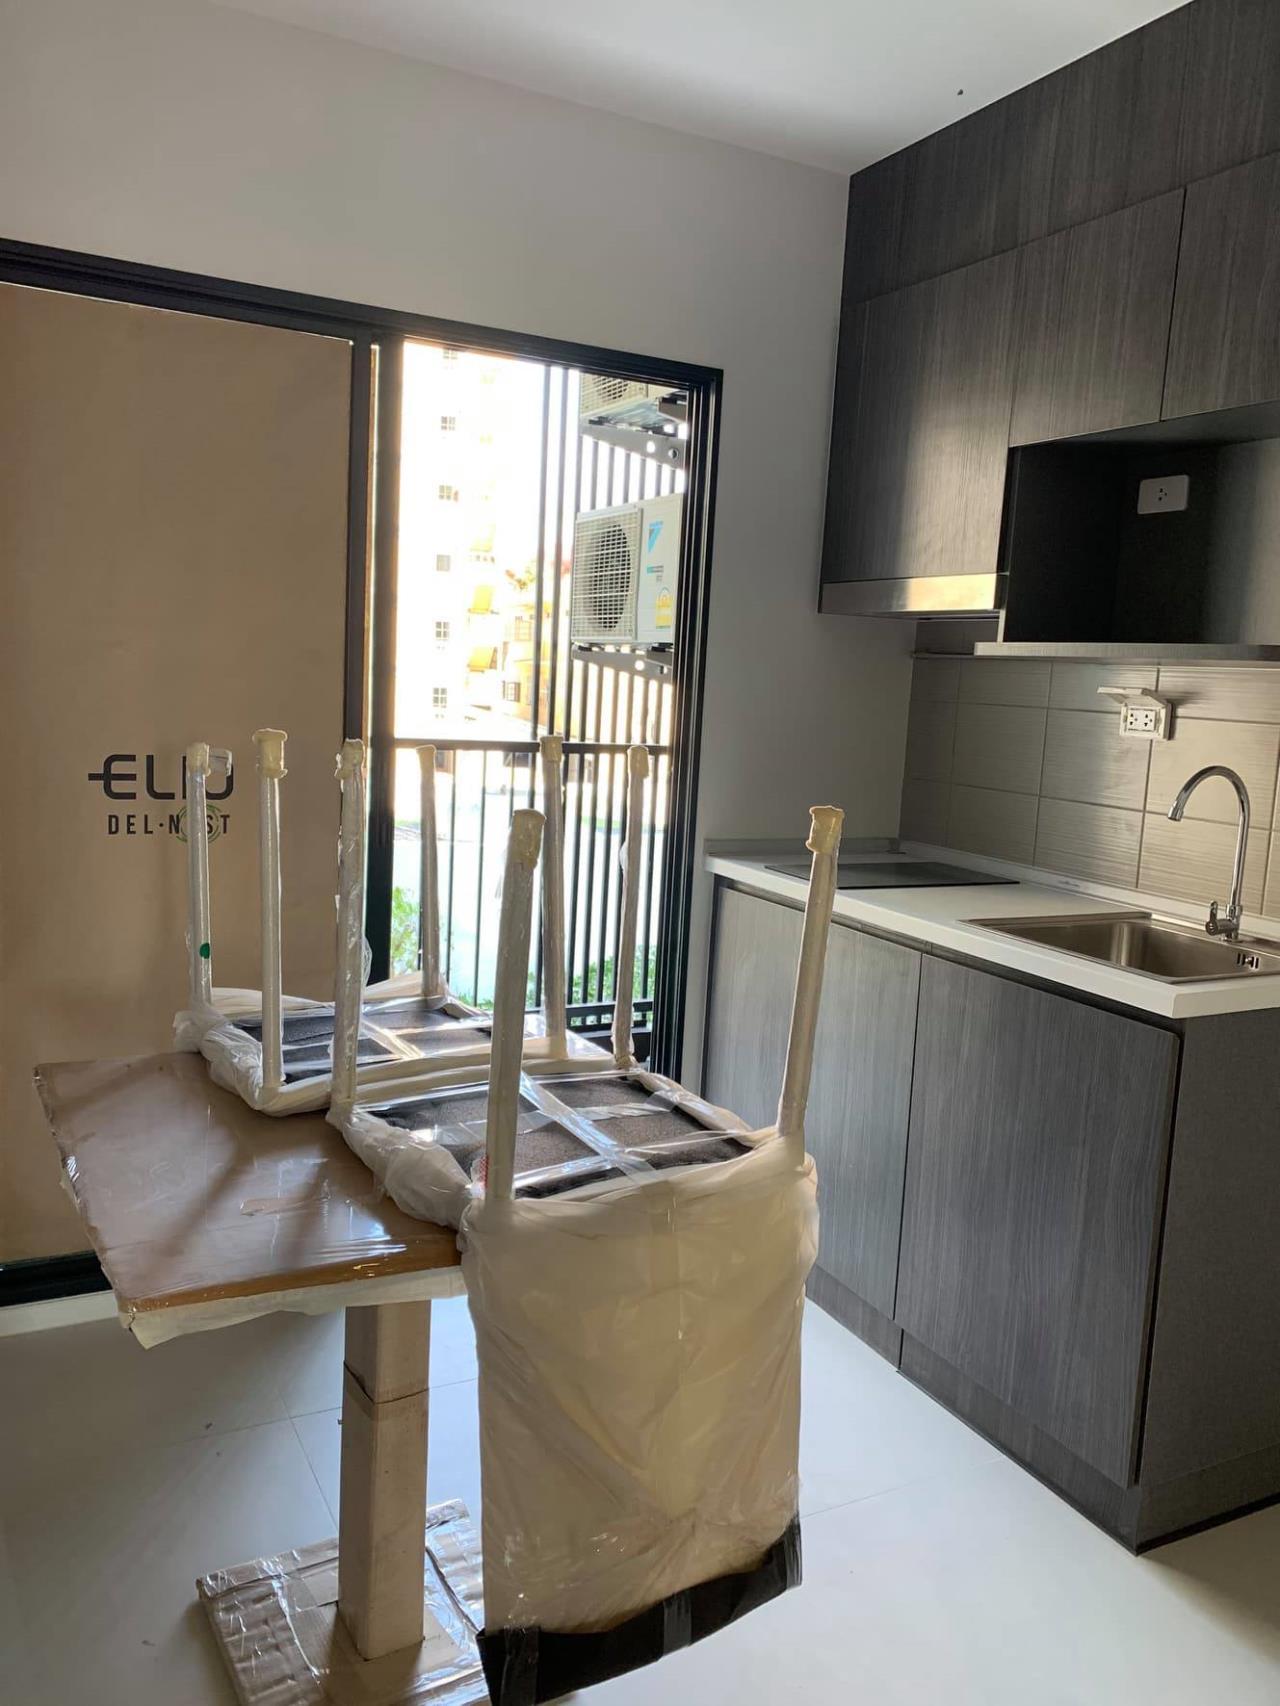 Blueocean property Agency's Condo For Rent – Elio Del Nest ( CODE : 20-06-0057-38 ) 7